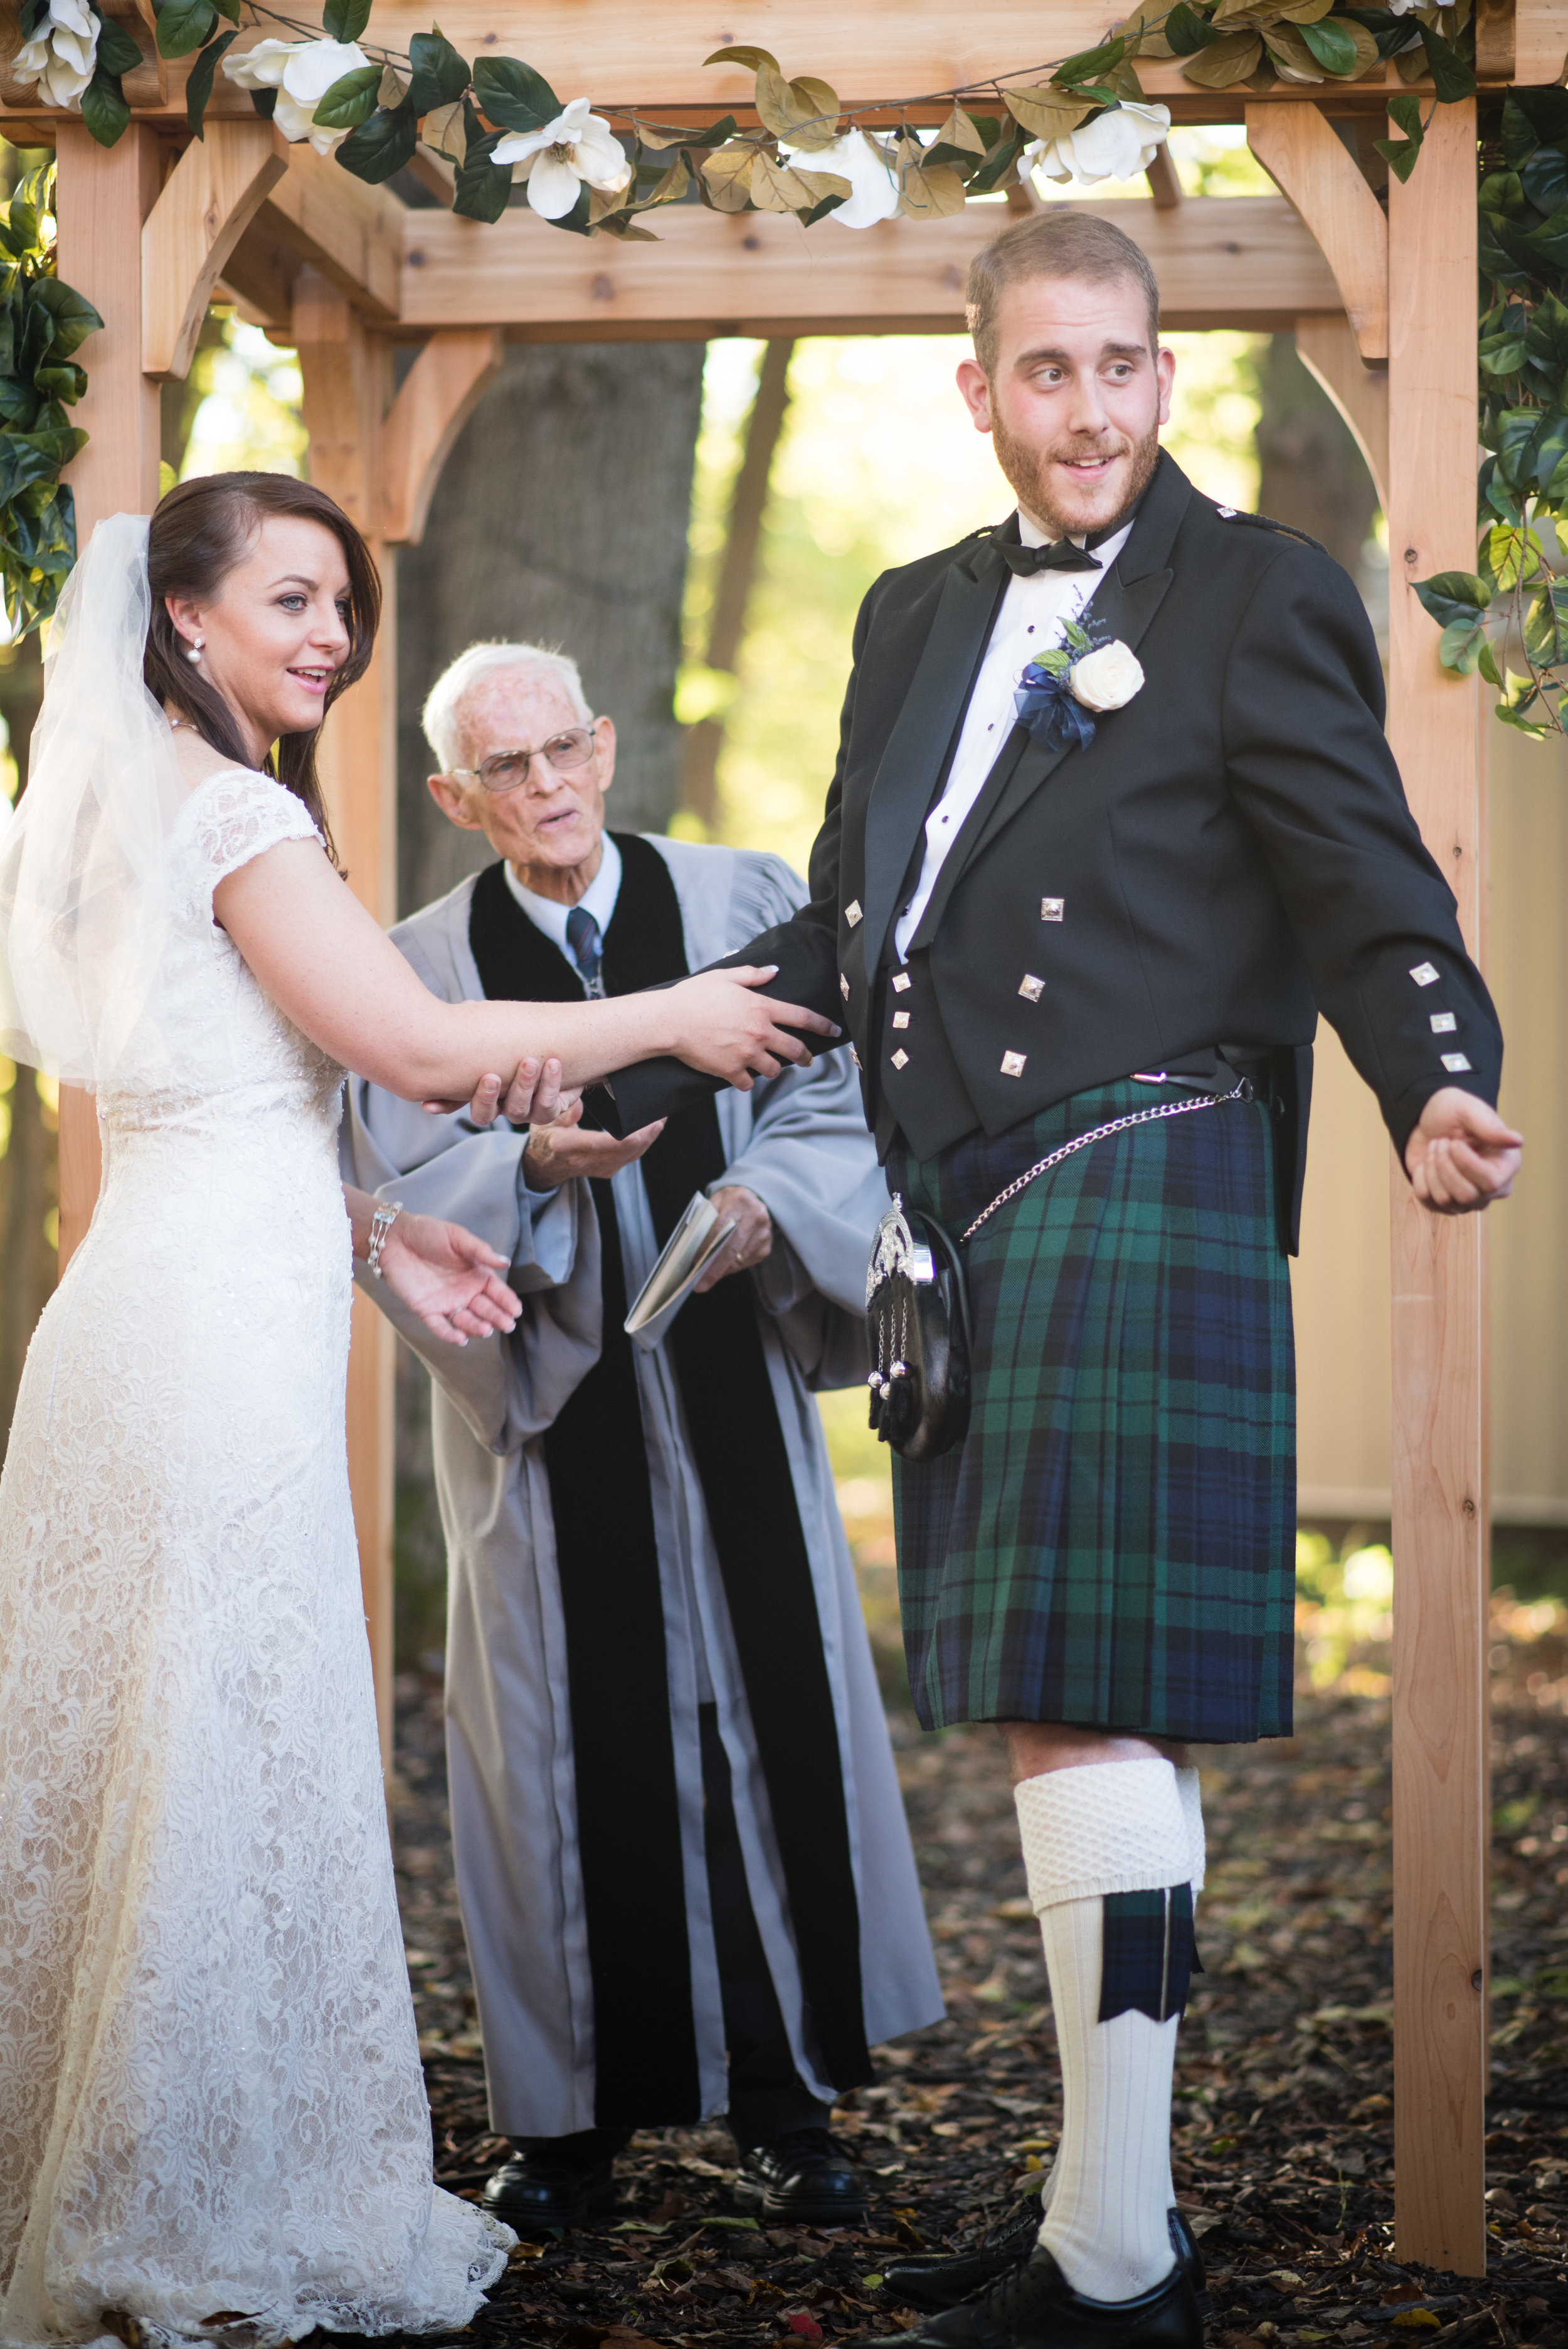 Michael+NIchole Wedding - Ceremony-50.jpg